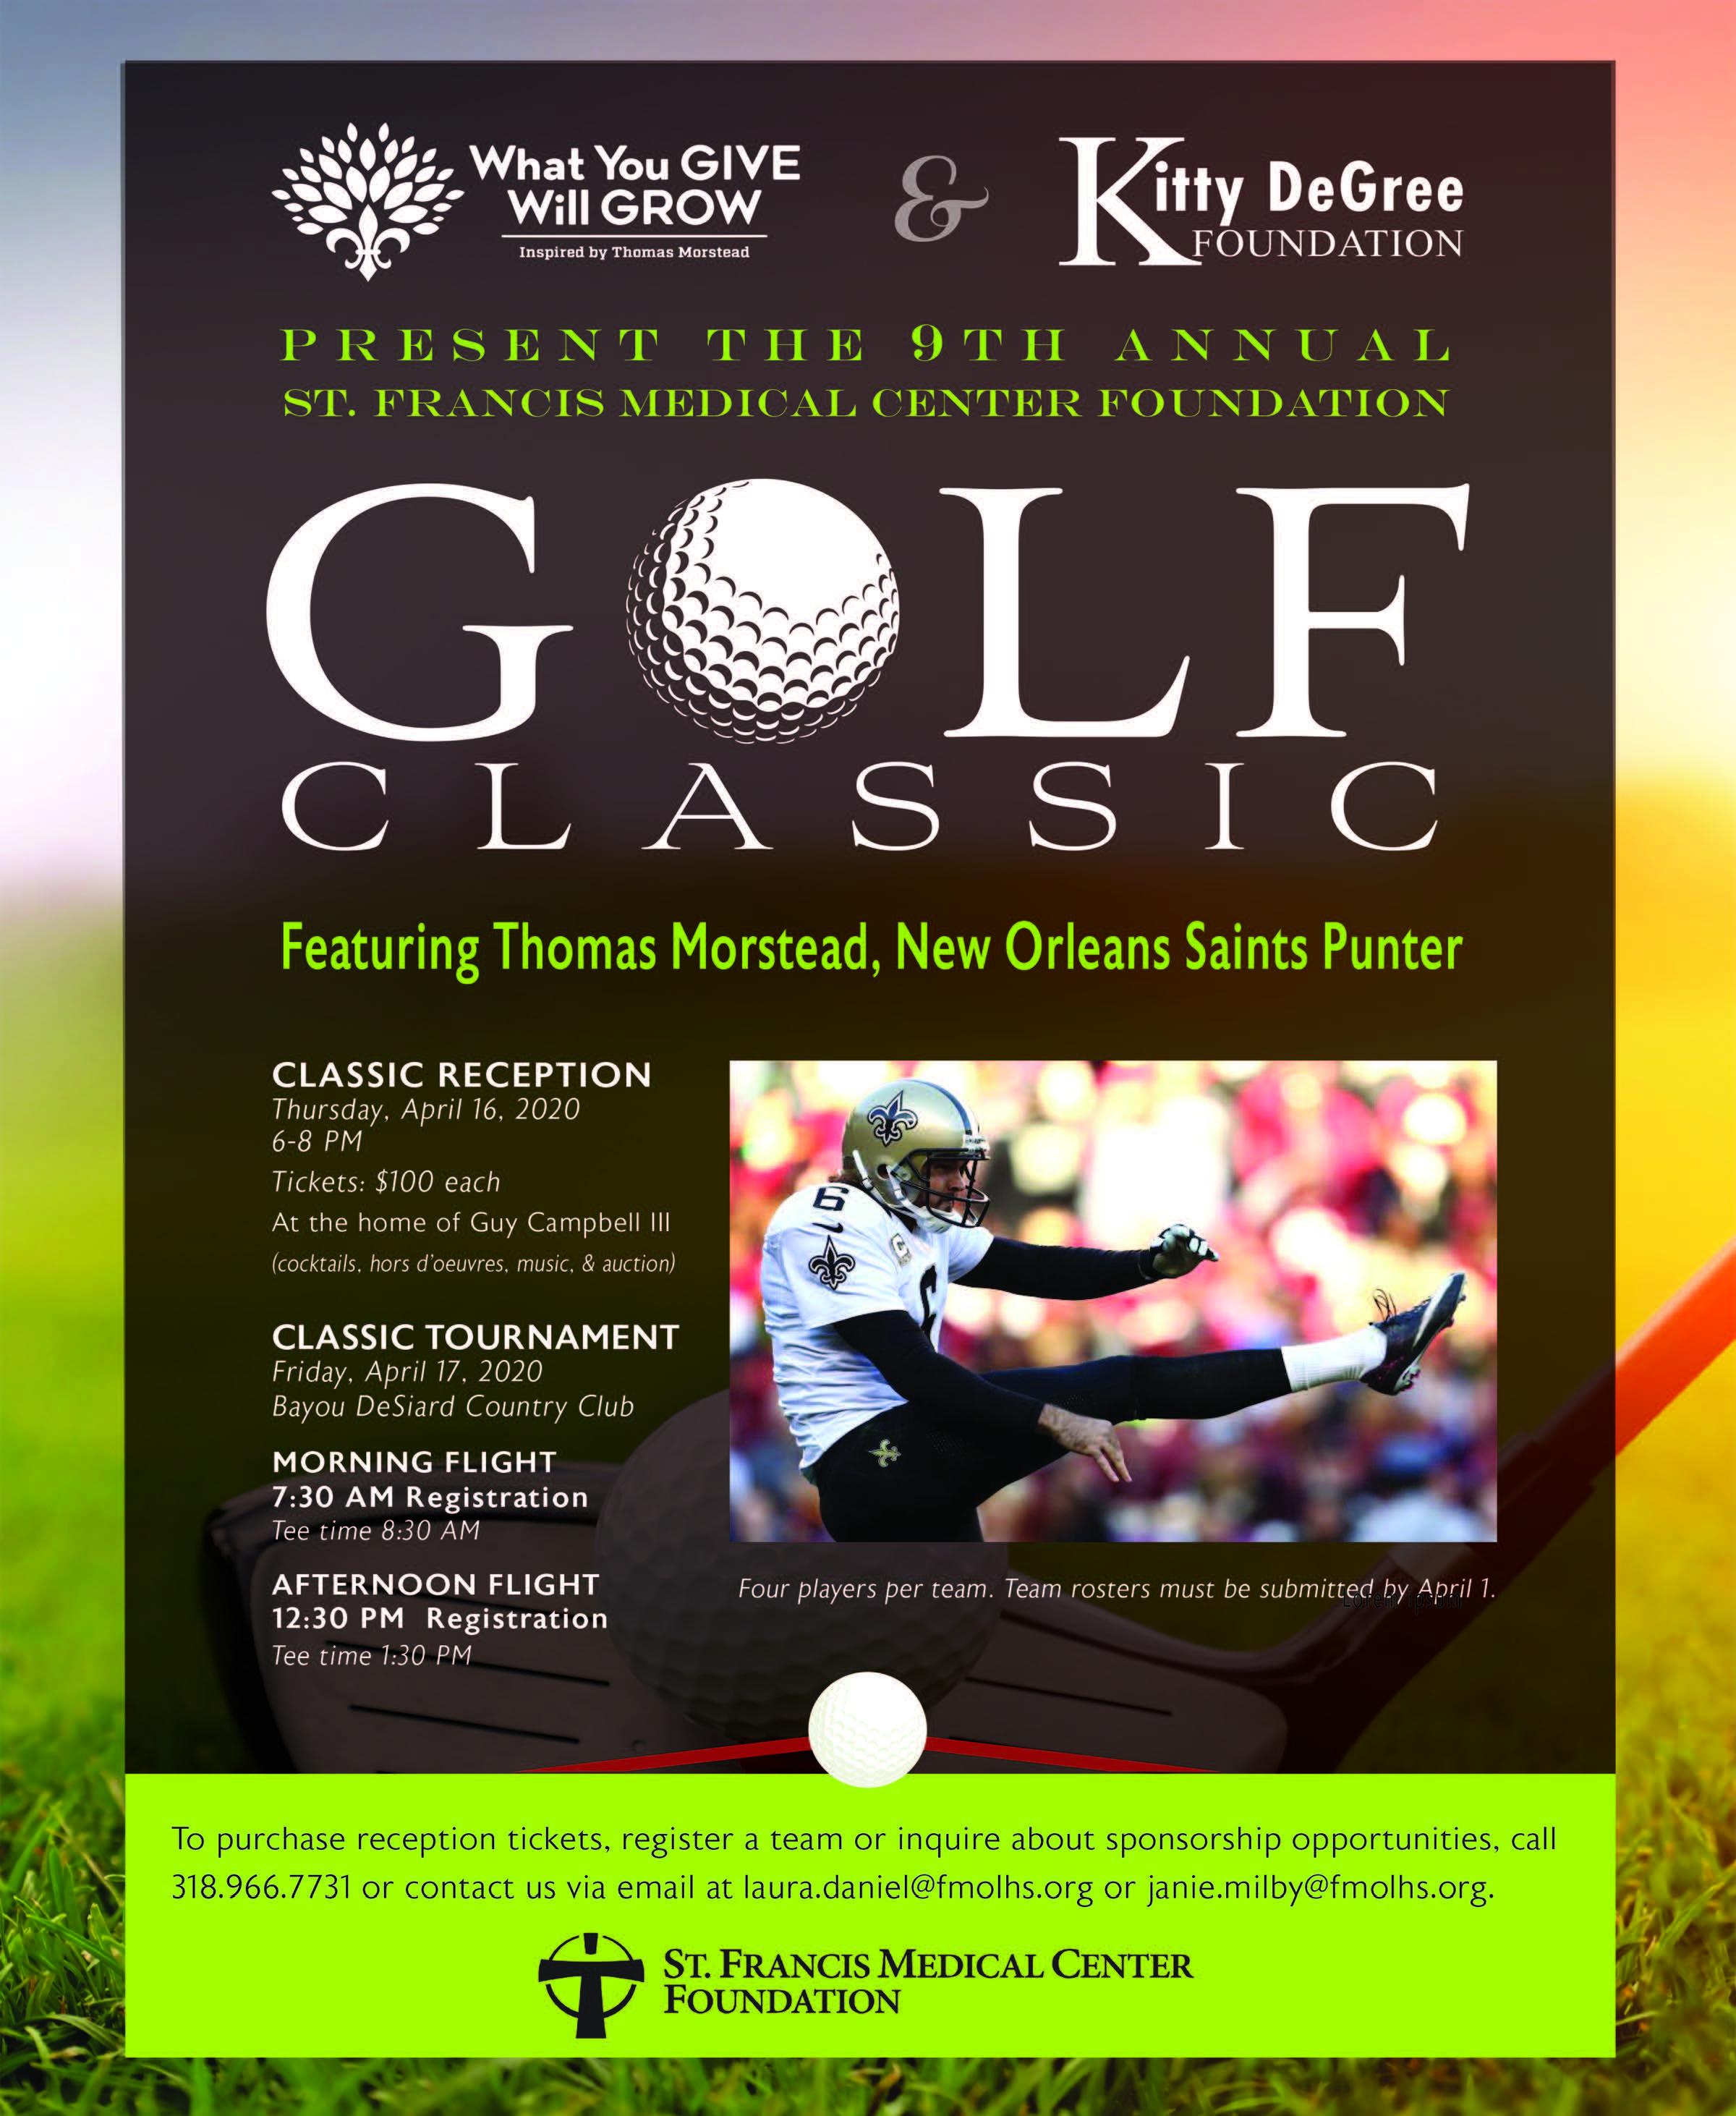 Golf Classic Monroe, Louisiana (LA), St. Francis Medical